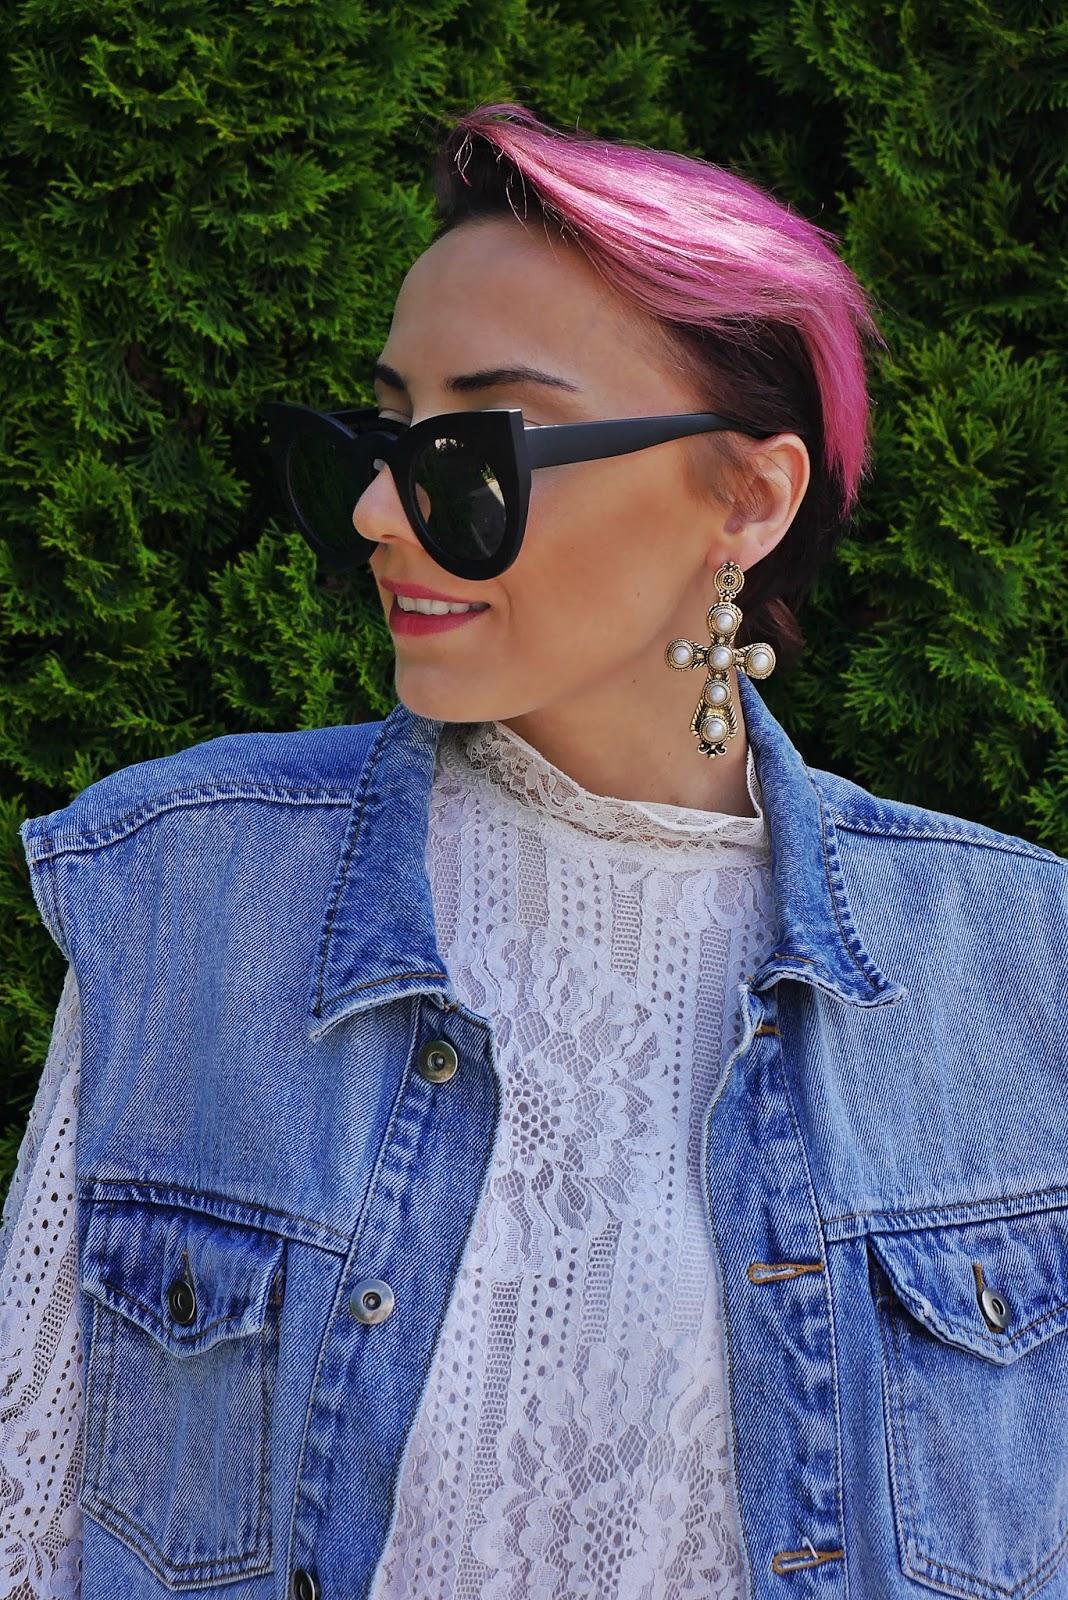 lace_dress_transparent_yezzy_shoes_karyn_blog_modowy_oversize_denim_220617a